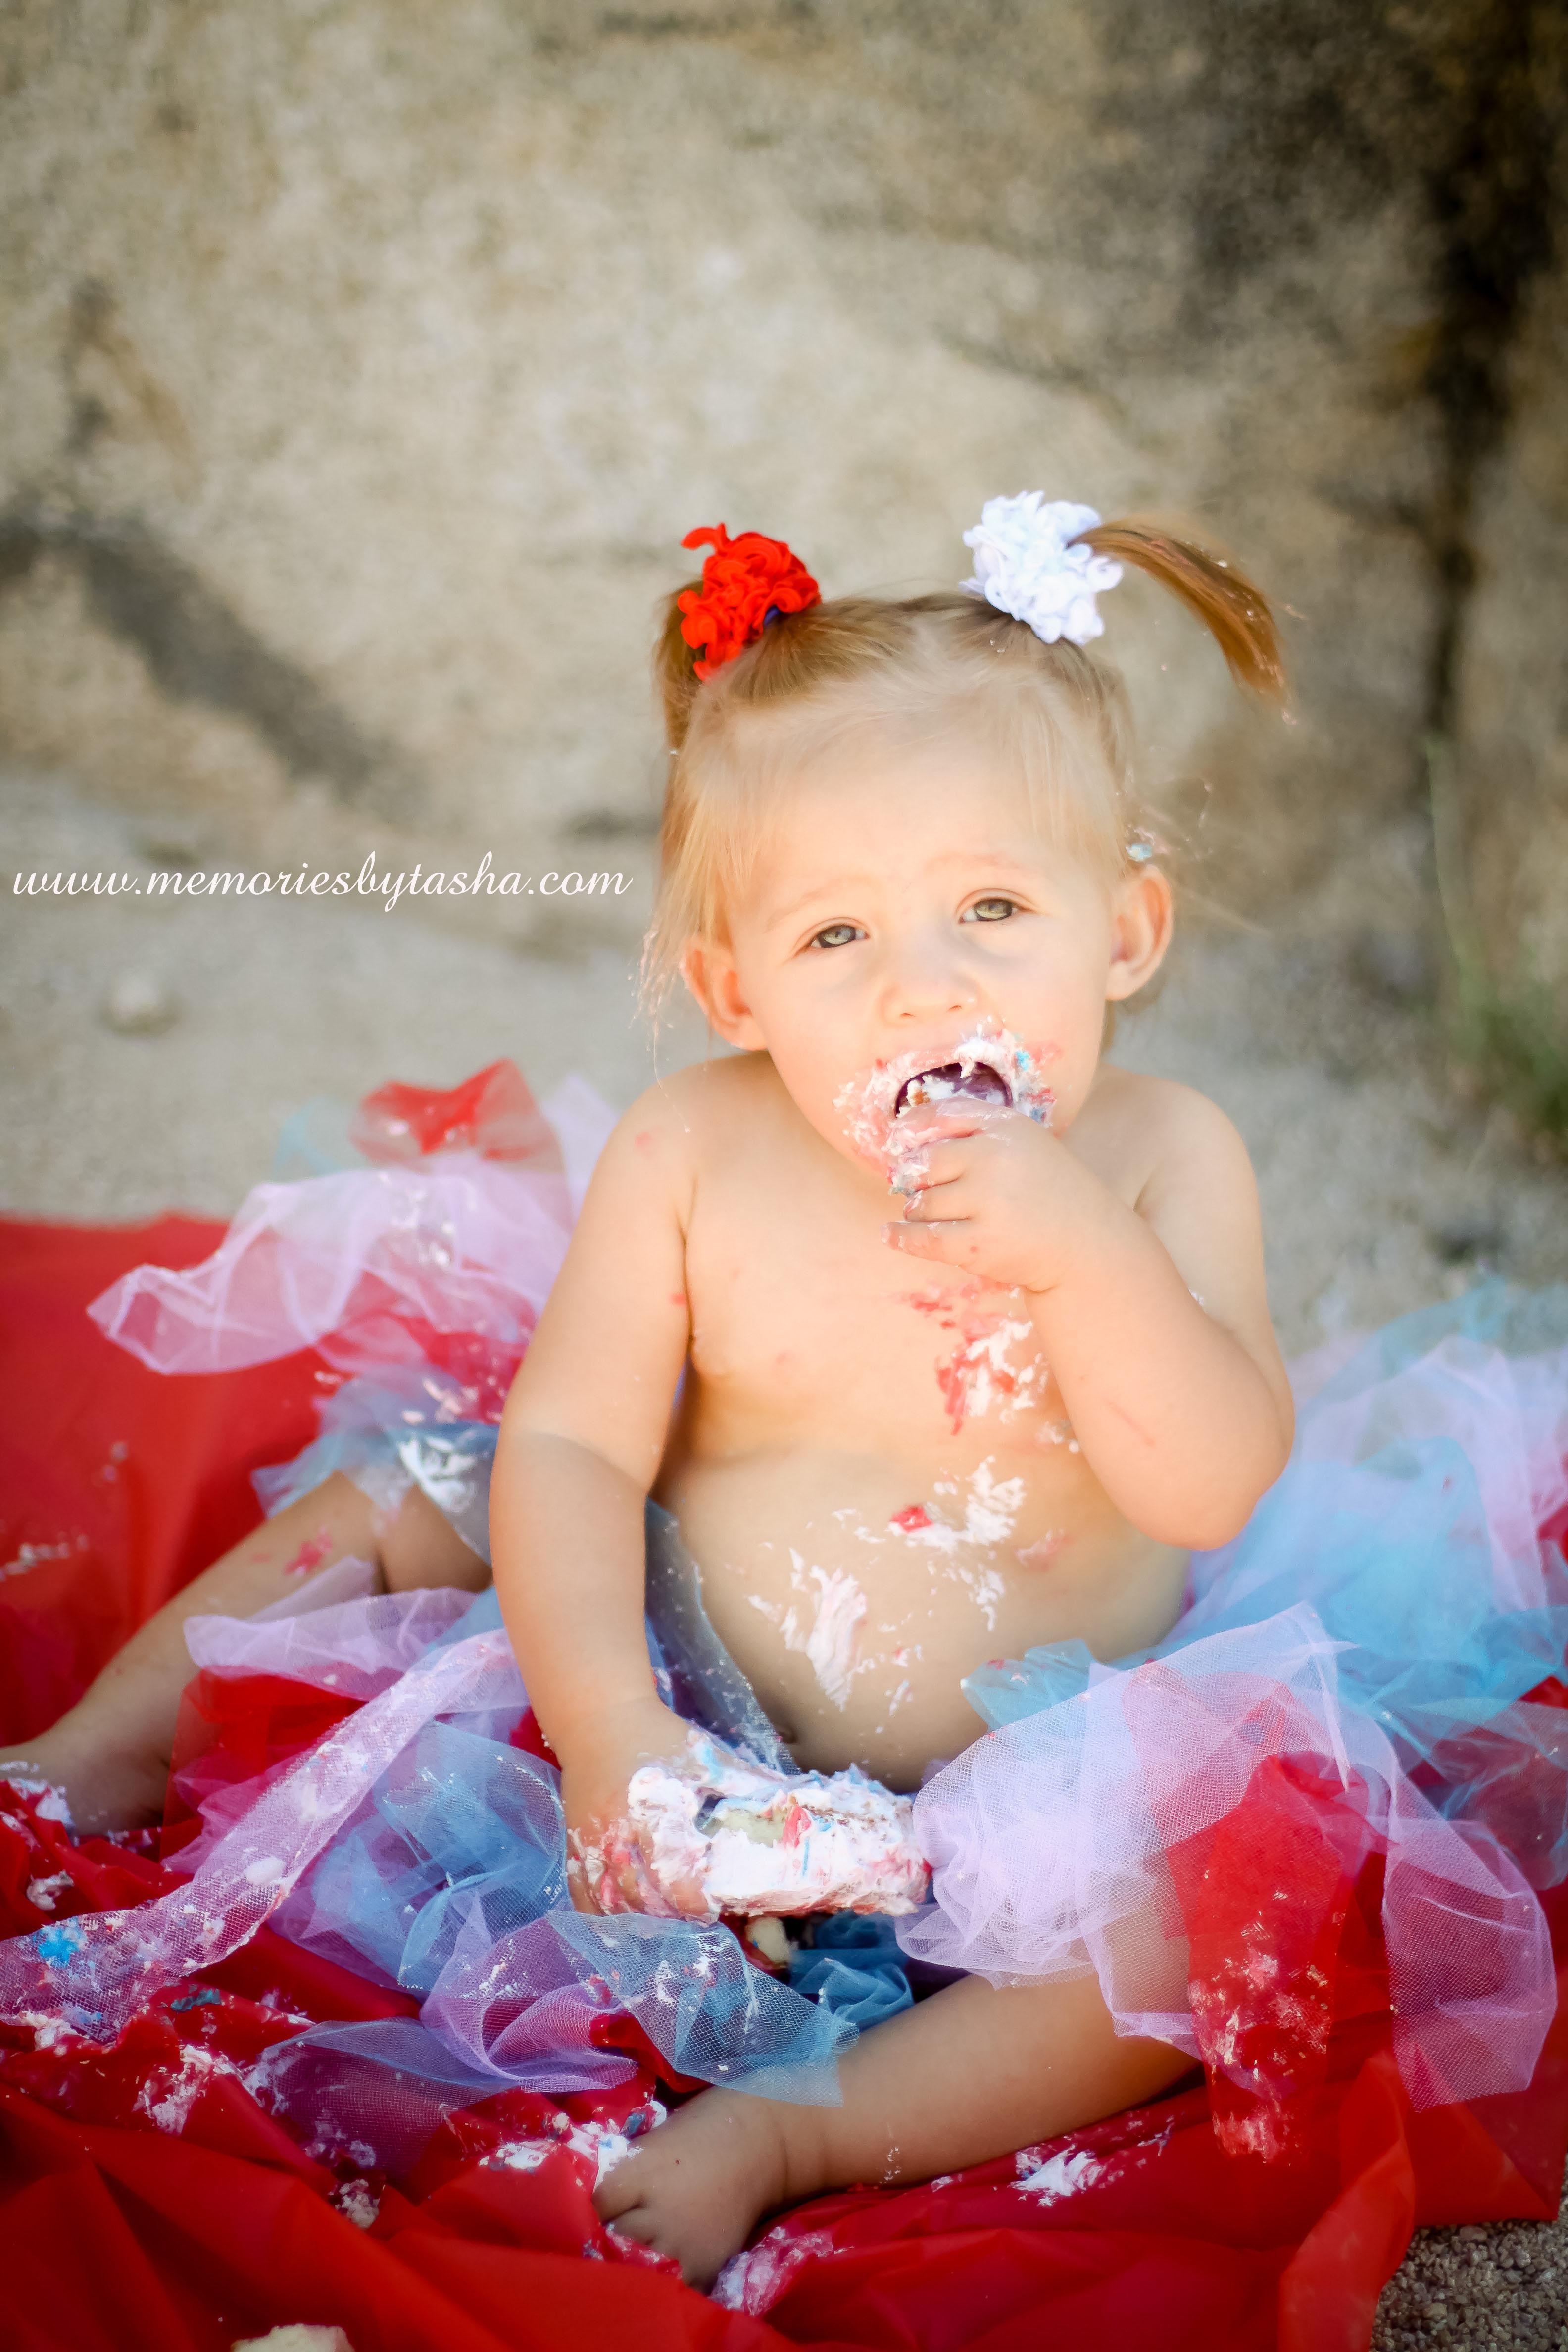 Twentynine Palms Photographer - Couples Photography - Family Photography - Children's Photography - Cake Smash-02